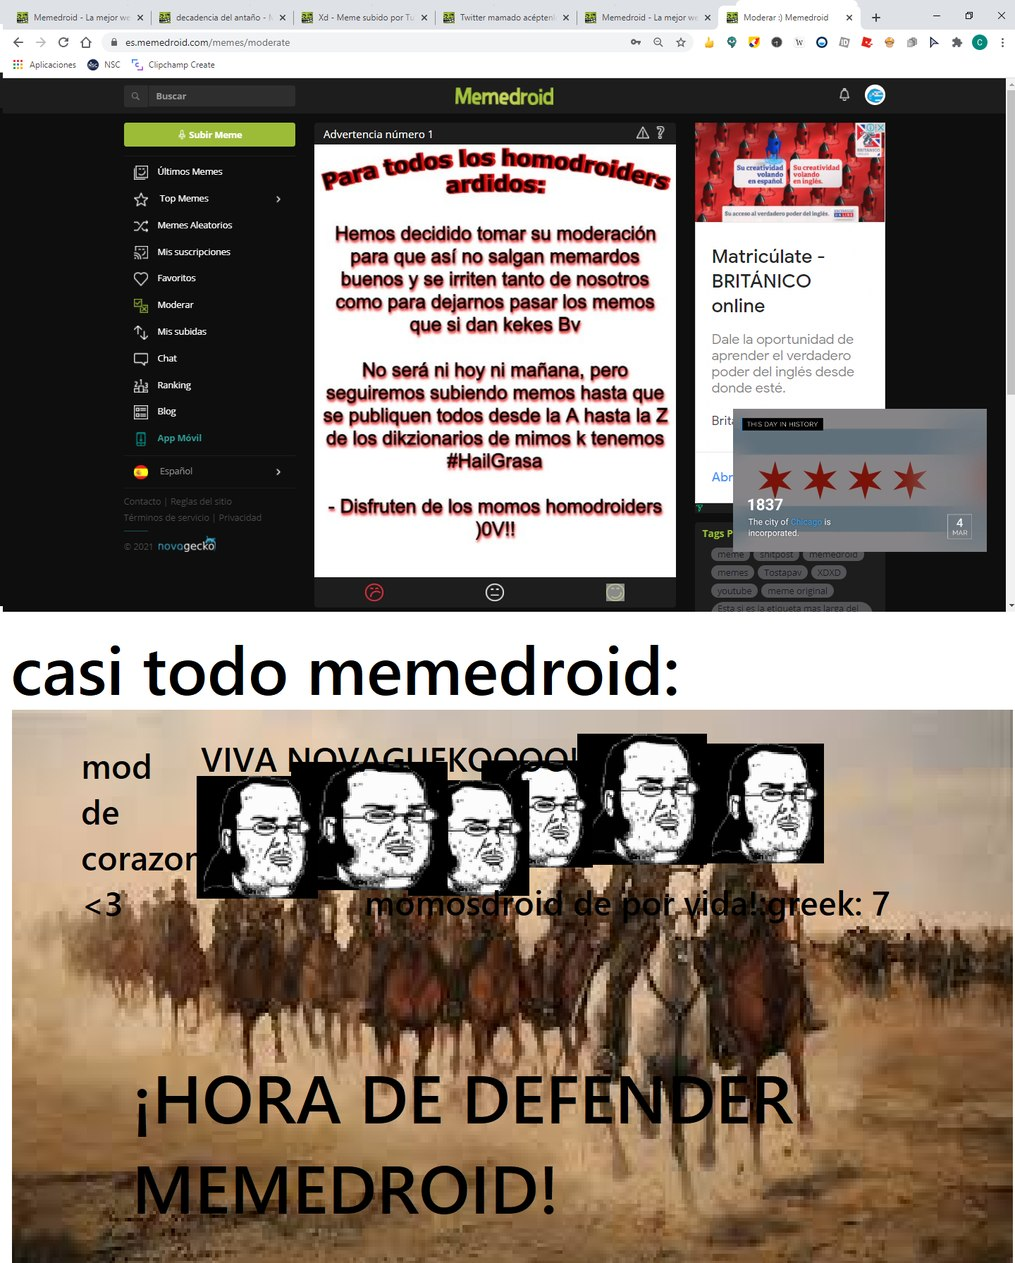 a defender momosdroid!11111 :greek: 7 - meme